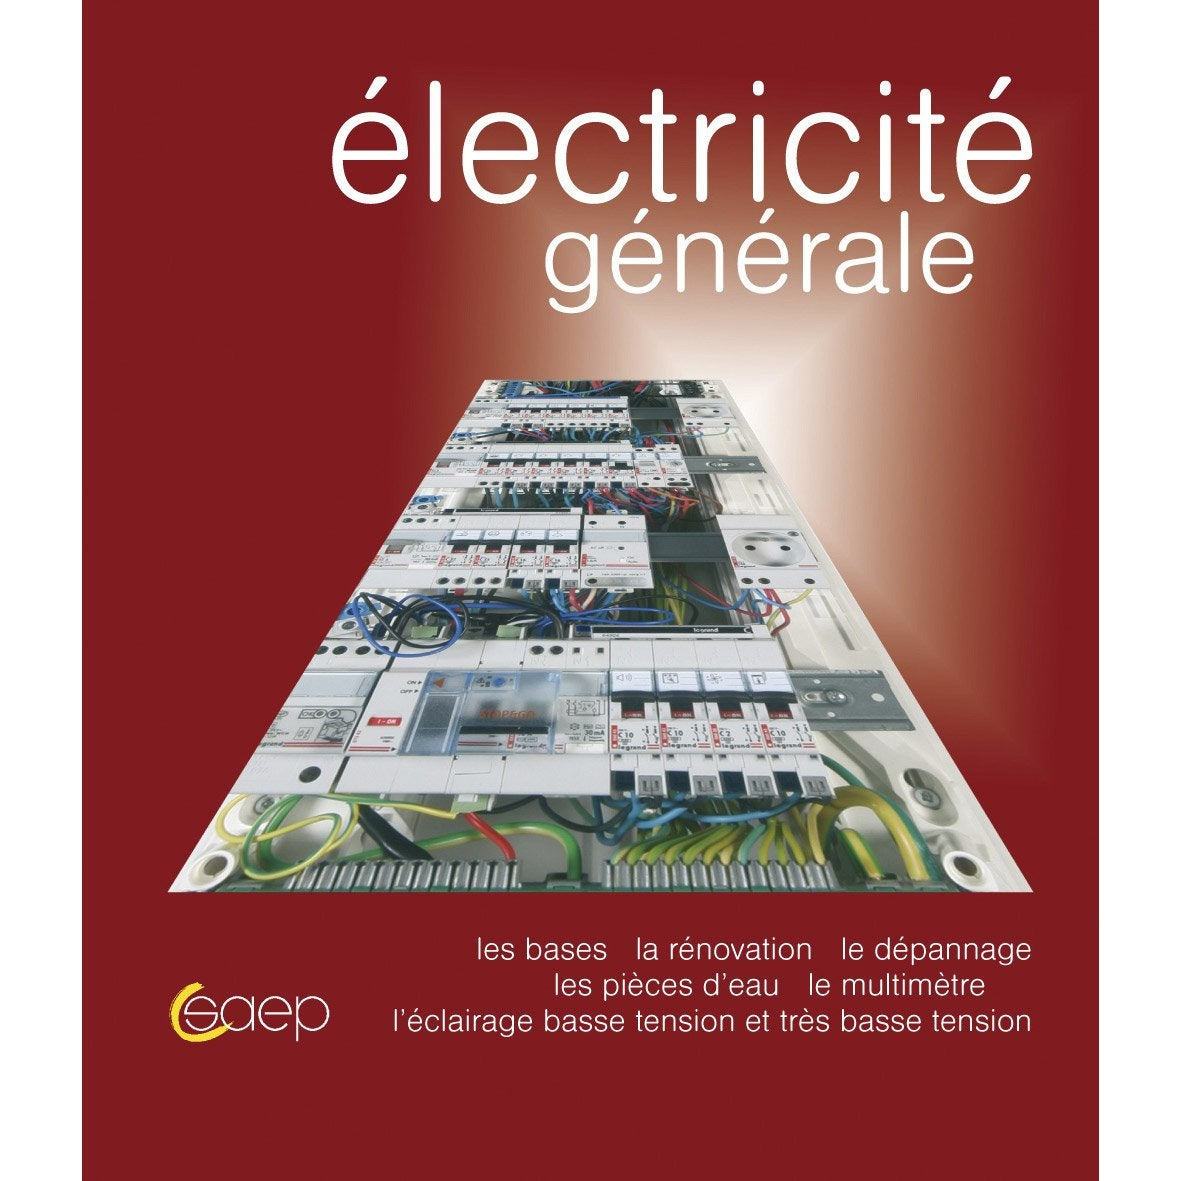 Electricit g n rale saep leroy merlin - Leroy merlin electricite ...